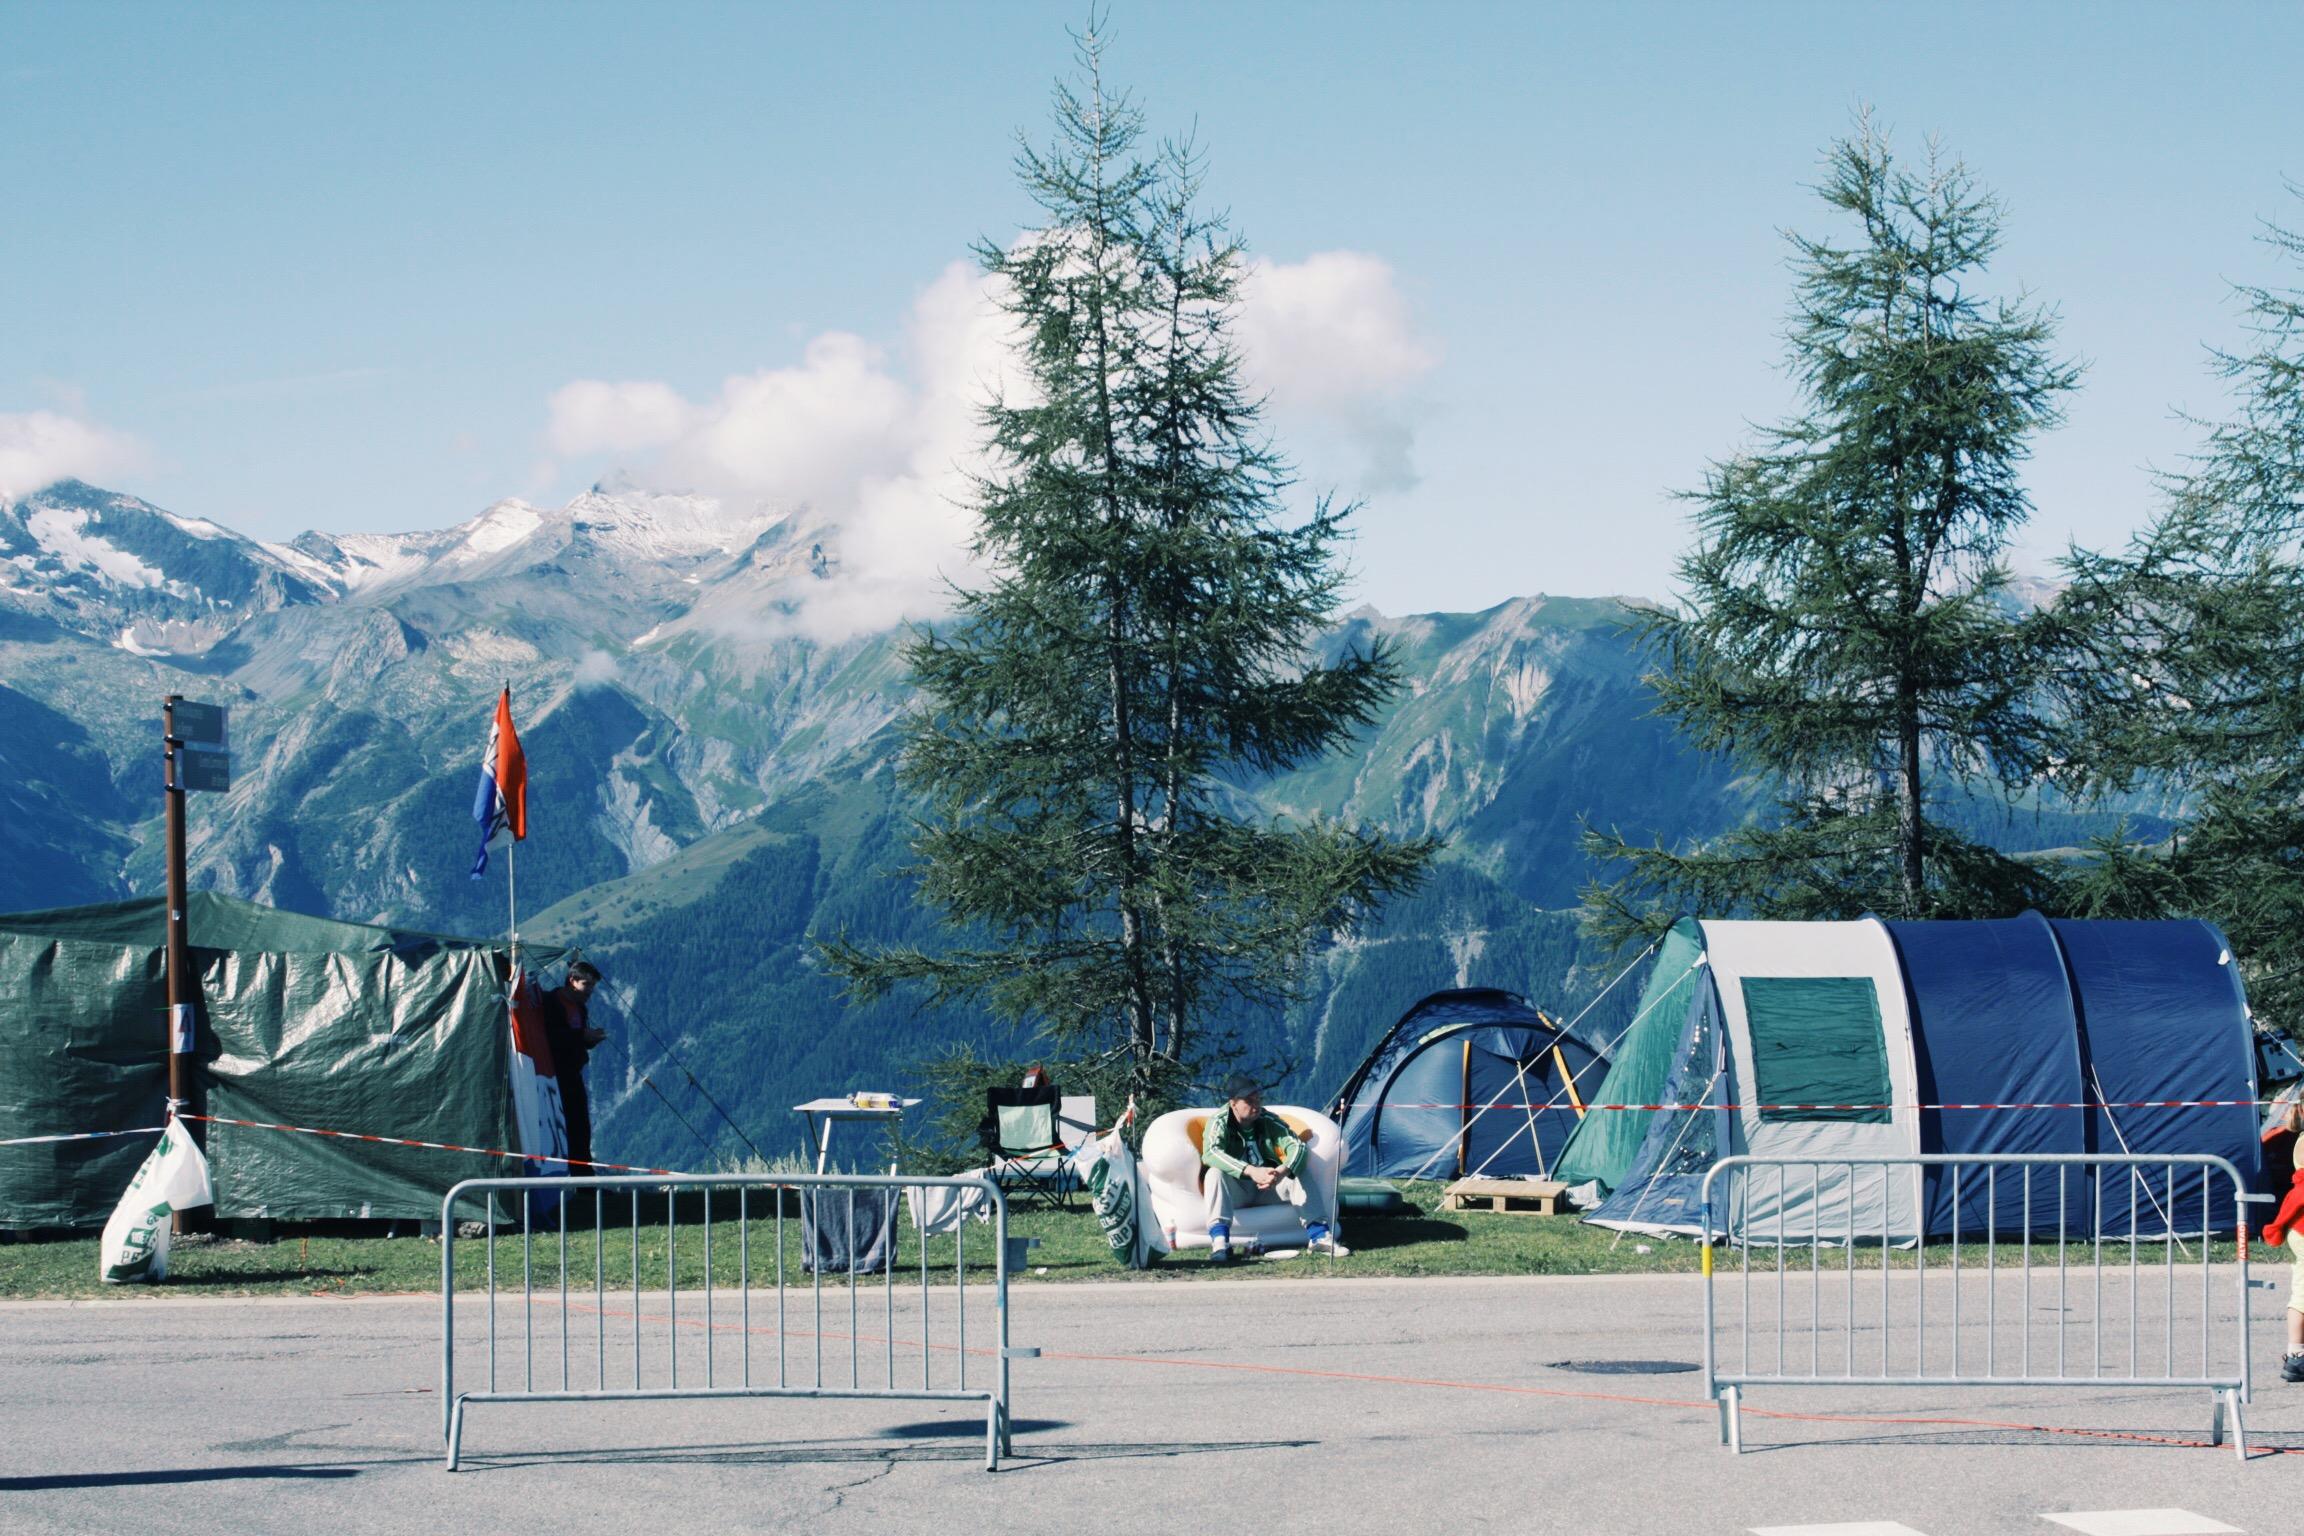 Mornings at Alpe D'Huez